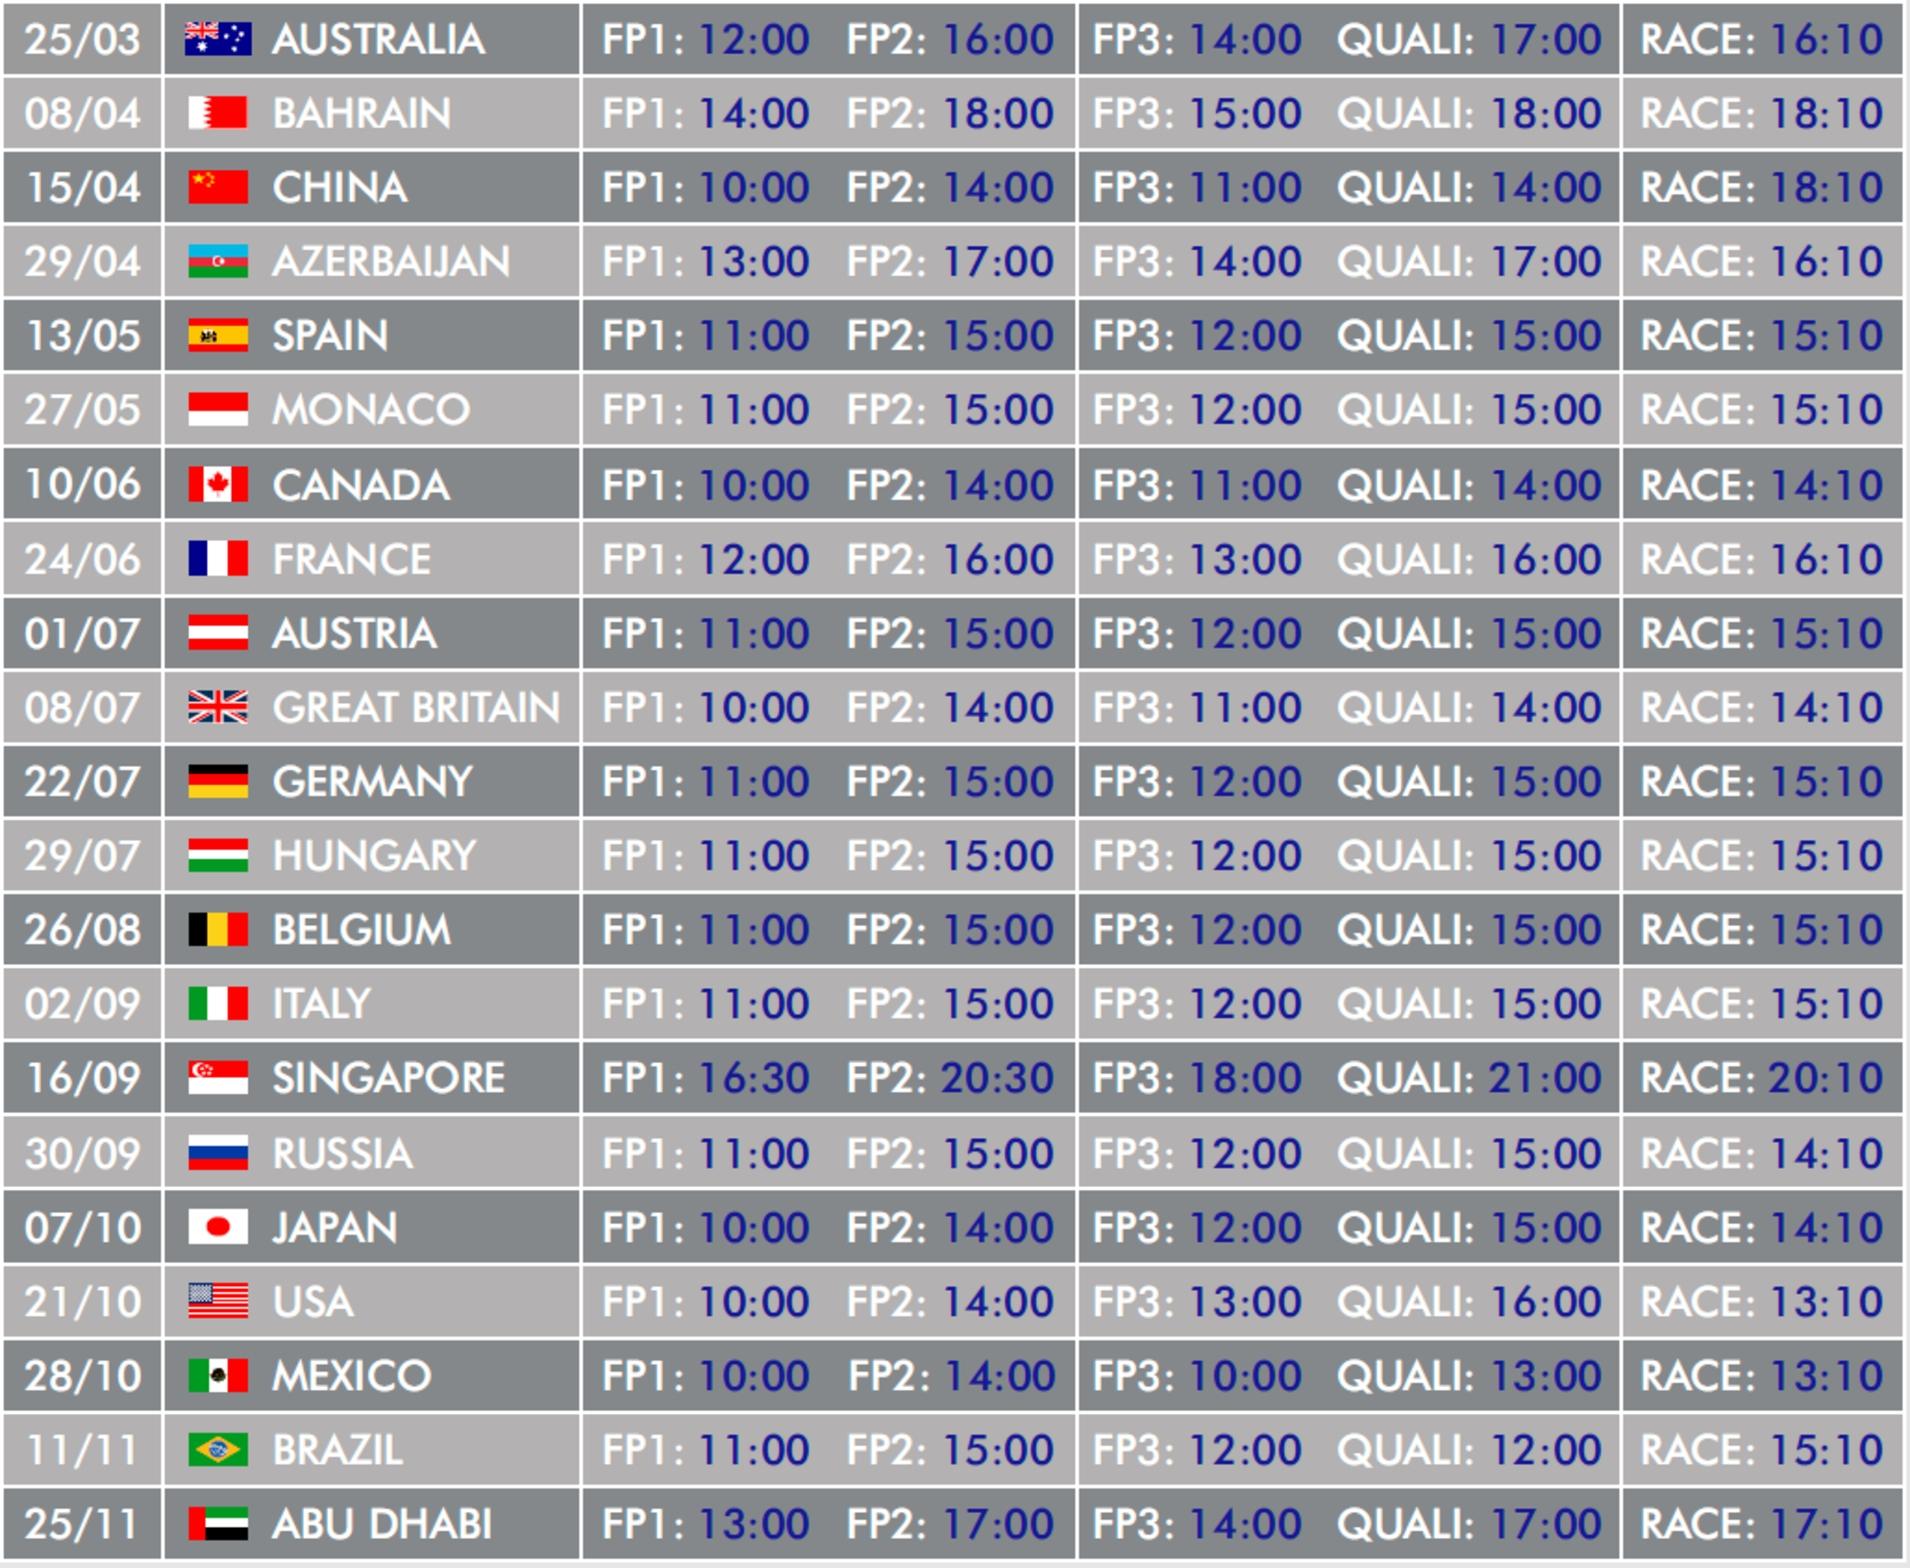 Formula 1 Calendar. F1 2020 Calendar. 2019-08-16